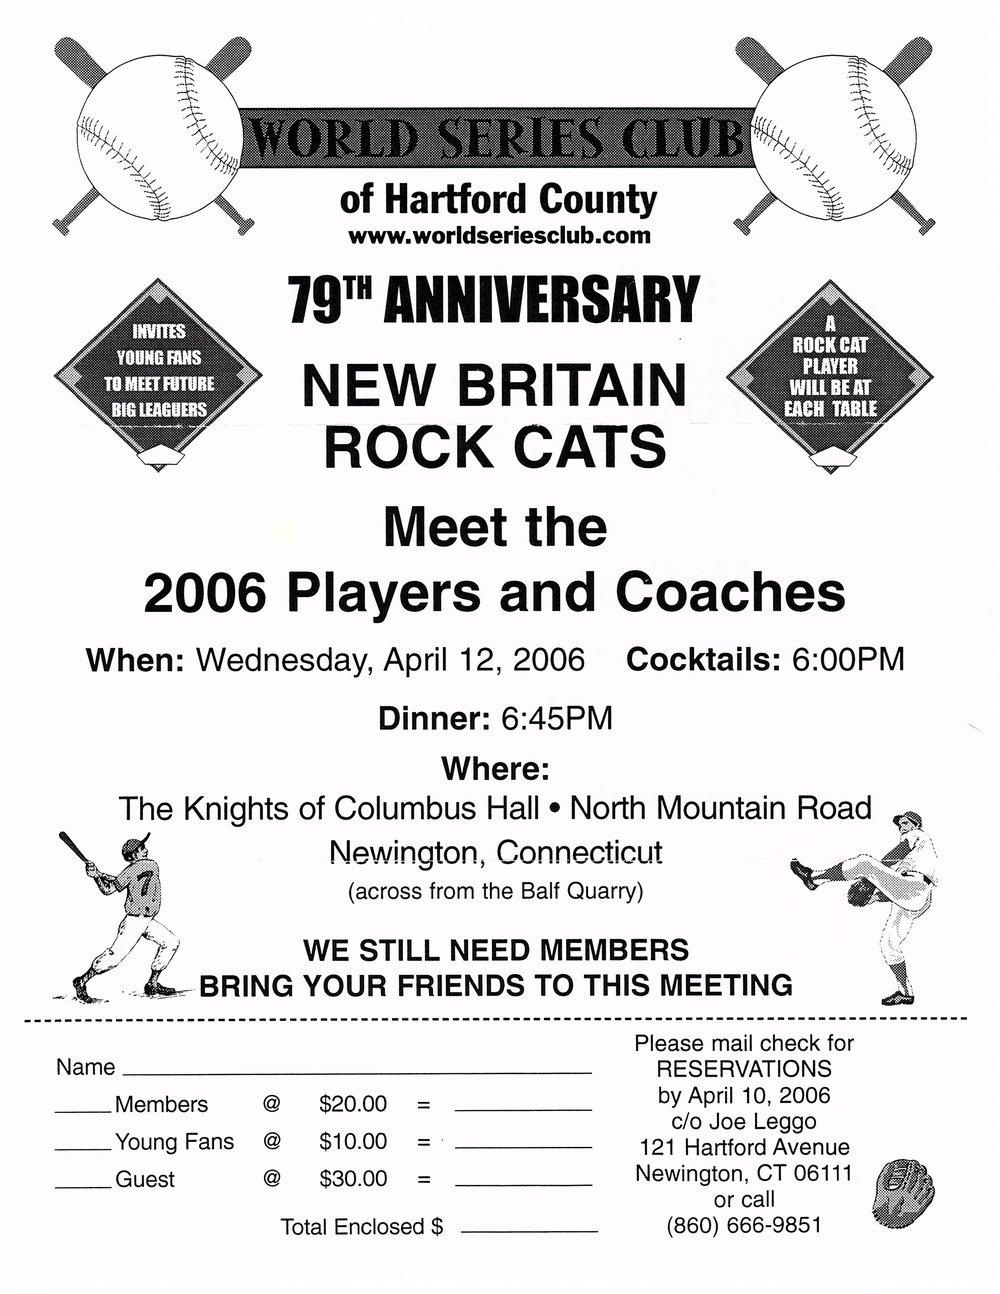 20060412 New Britain Rock Cats.jpg